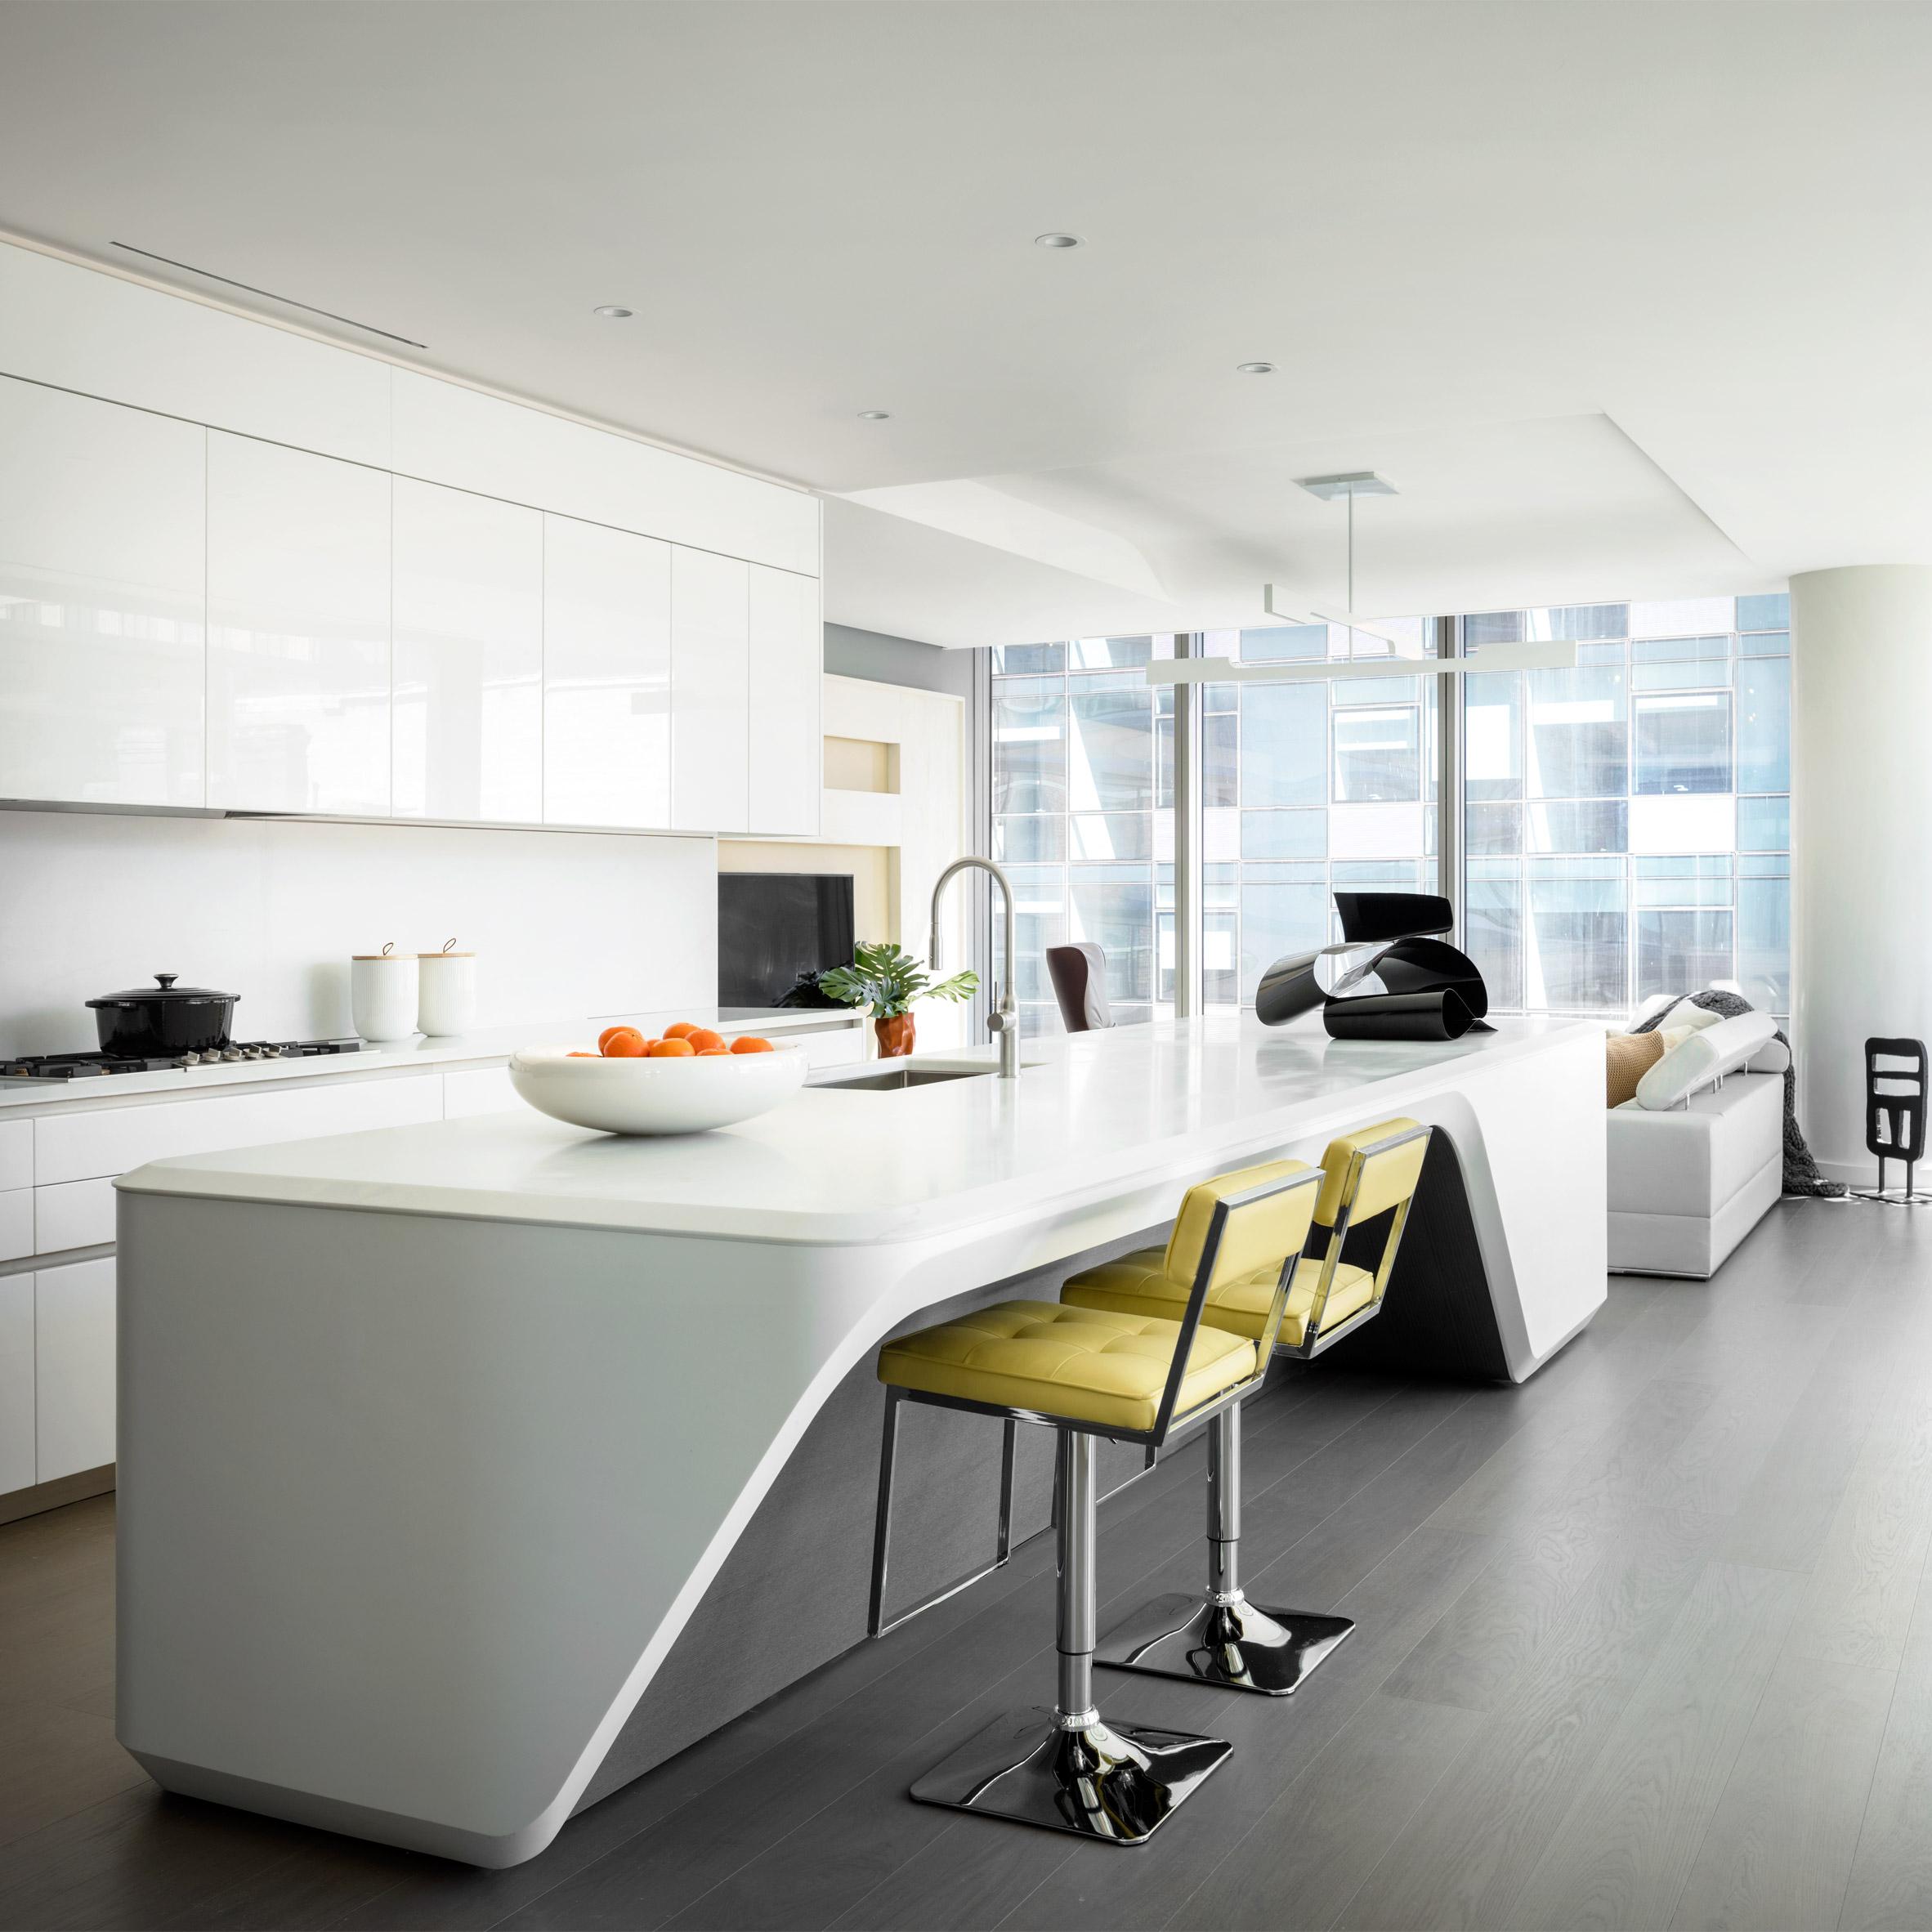 Boffi Soho New York   Designer Italian Kitchen Brand   Kitchen Design